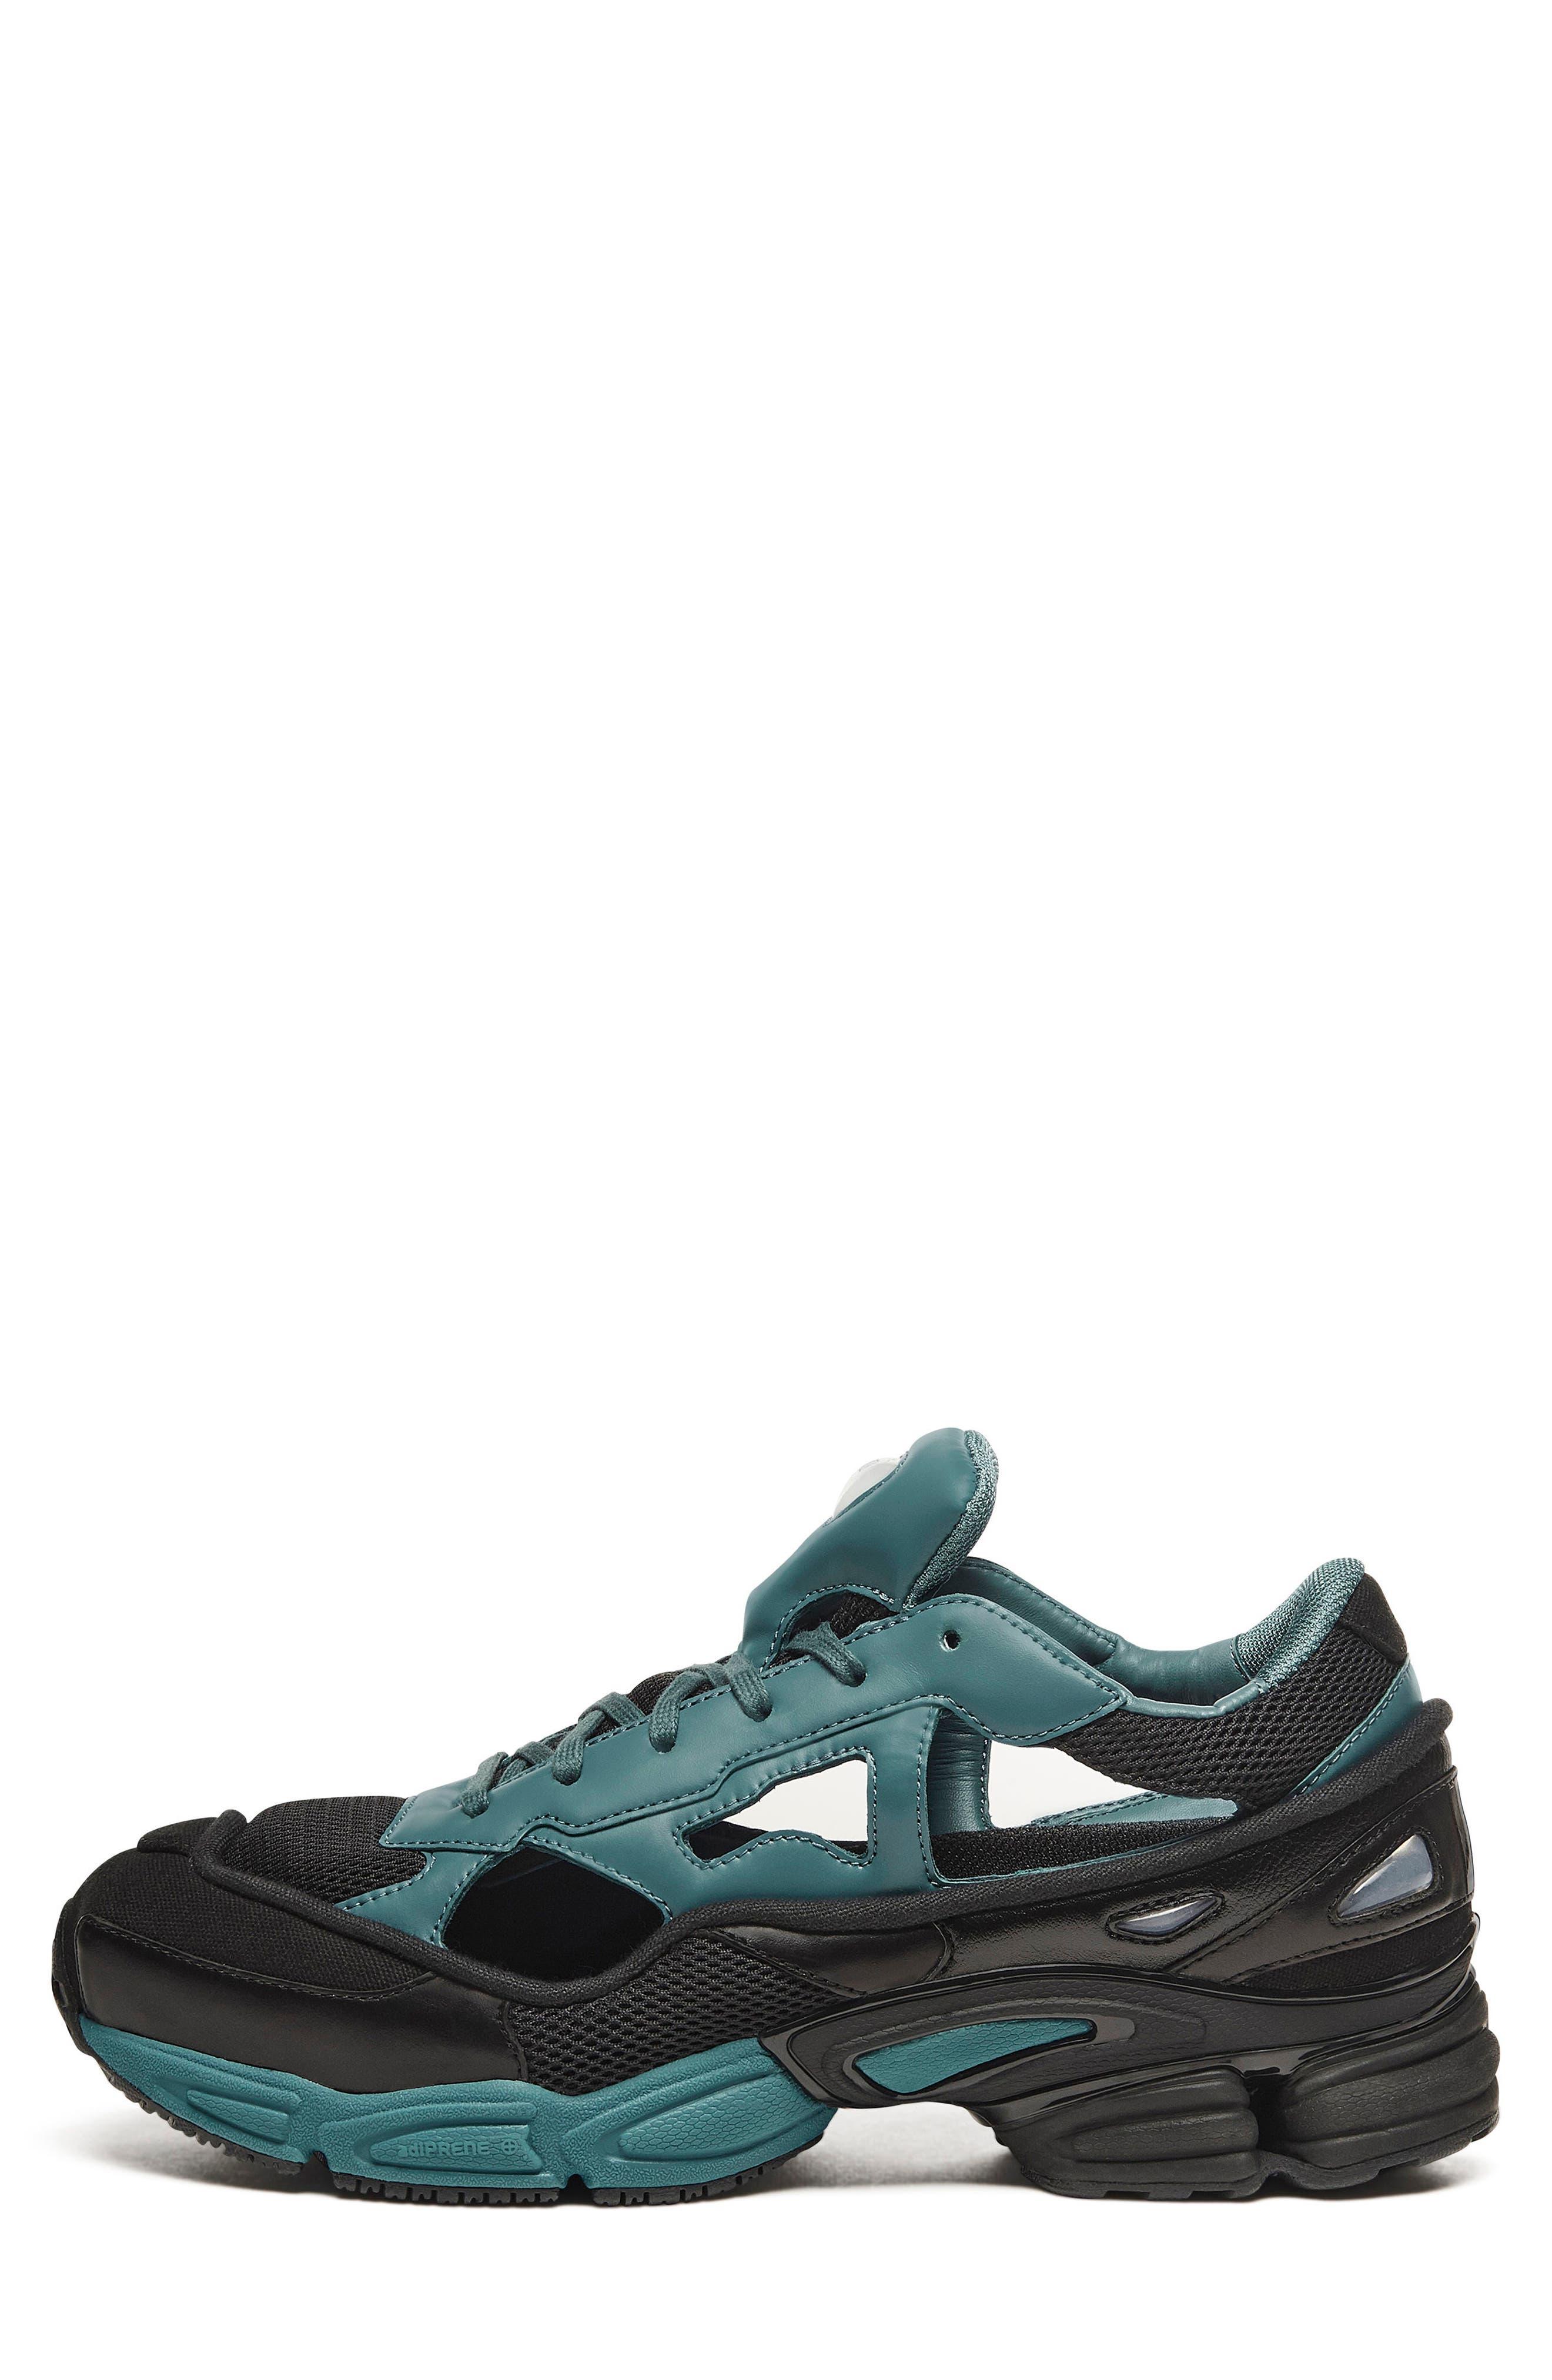 adidas x Raf Simons Replicant Ozweego Sneaker (Men)